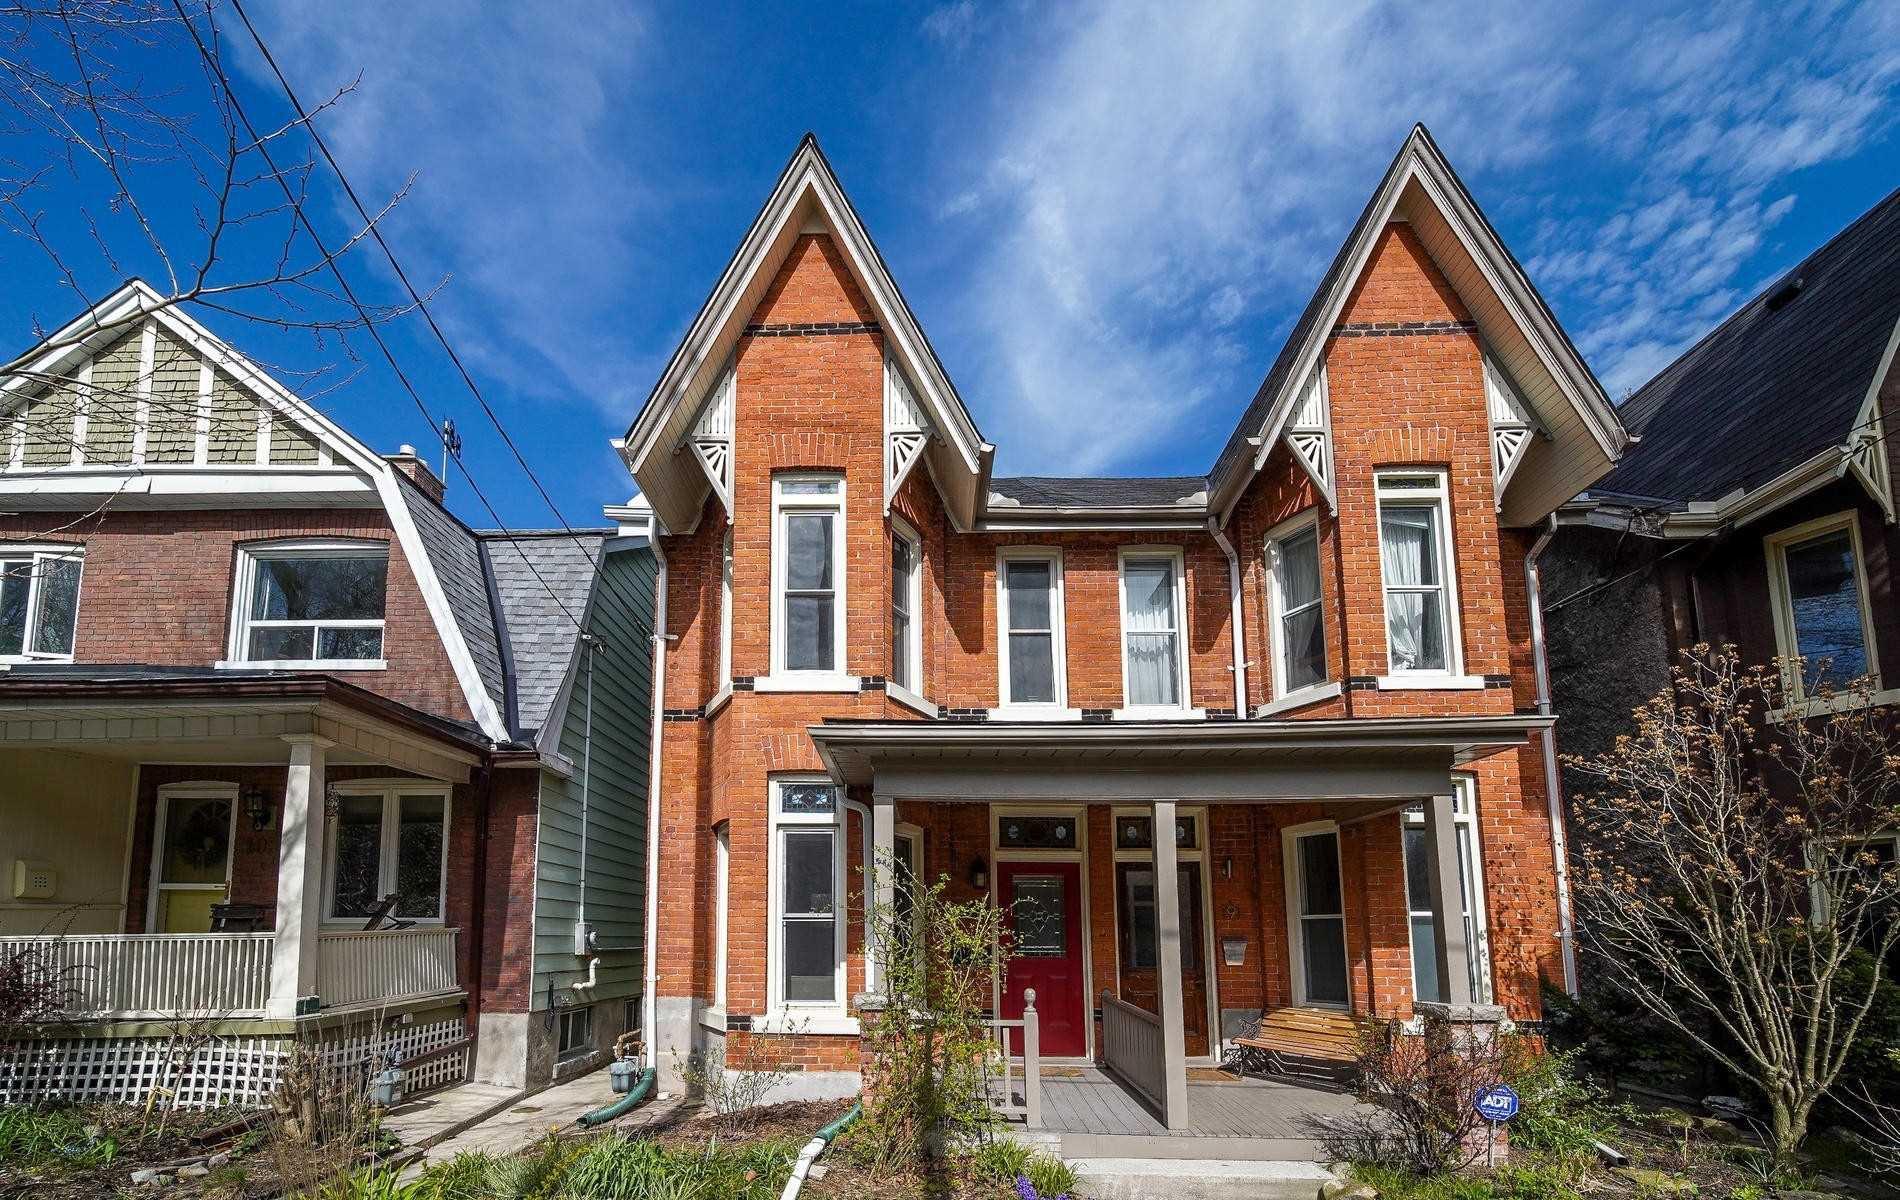 Main Photo: Videos: 193 Pape Avenue in Toronto: South Riverdale House (2-Storey) for sale (Toronto E01)  : MLS®# E4442818